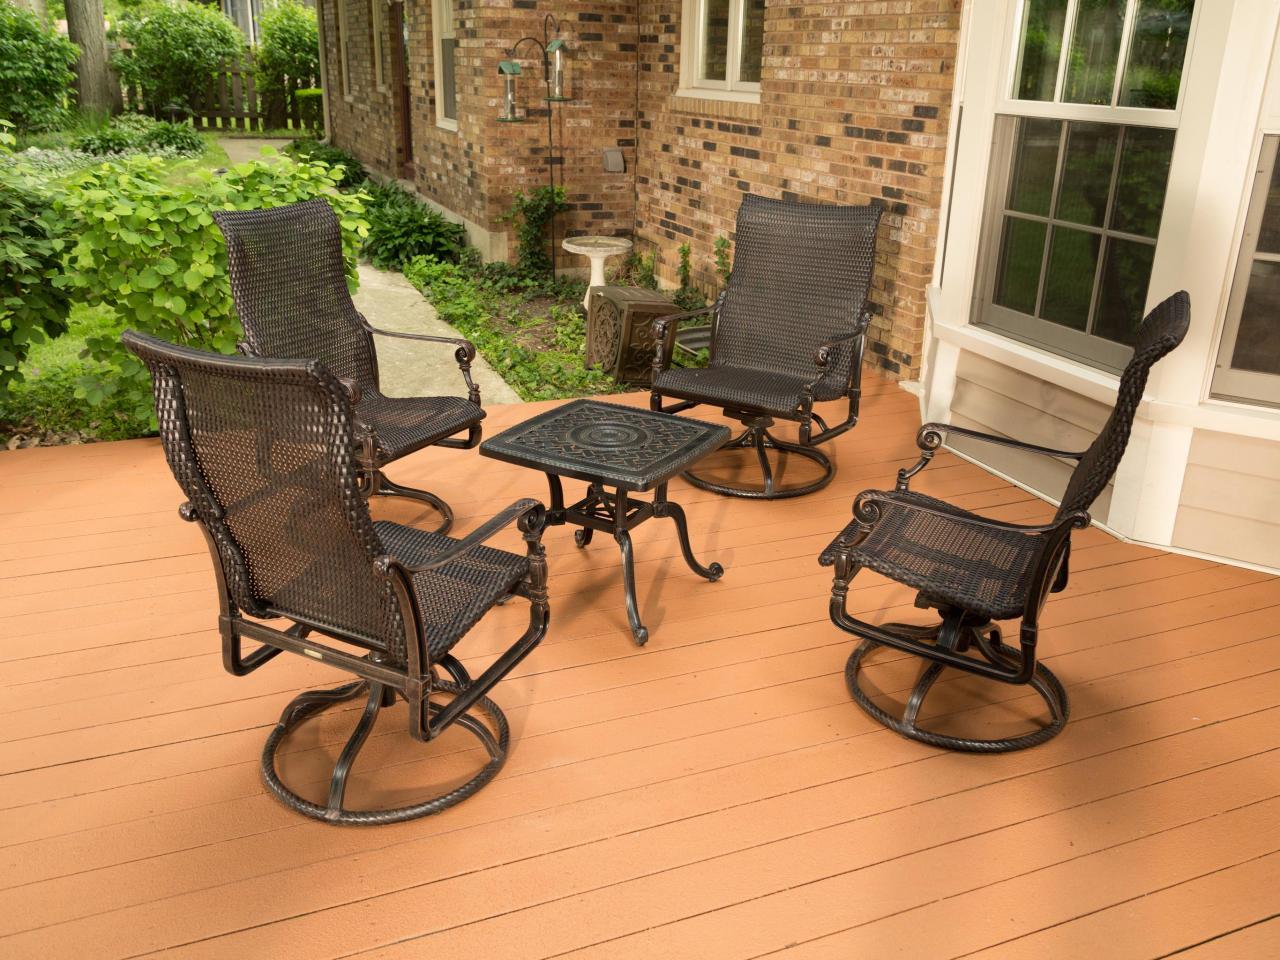 Painted Wood Patio Furniture Patio Small Patio Bench Luxury Furniture Outdoor Garden Regarding